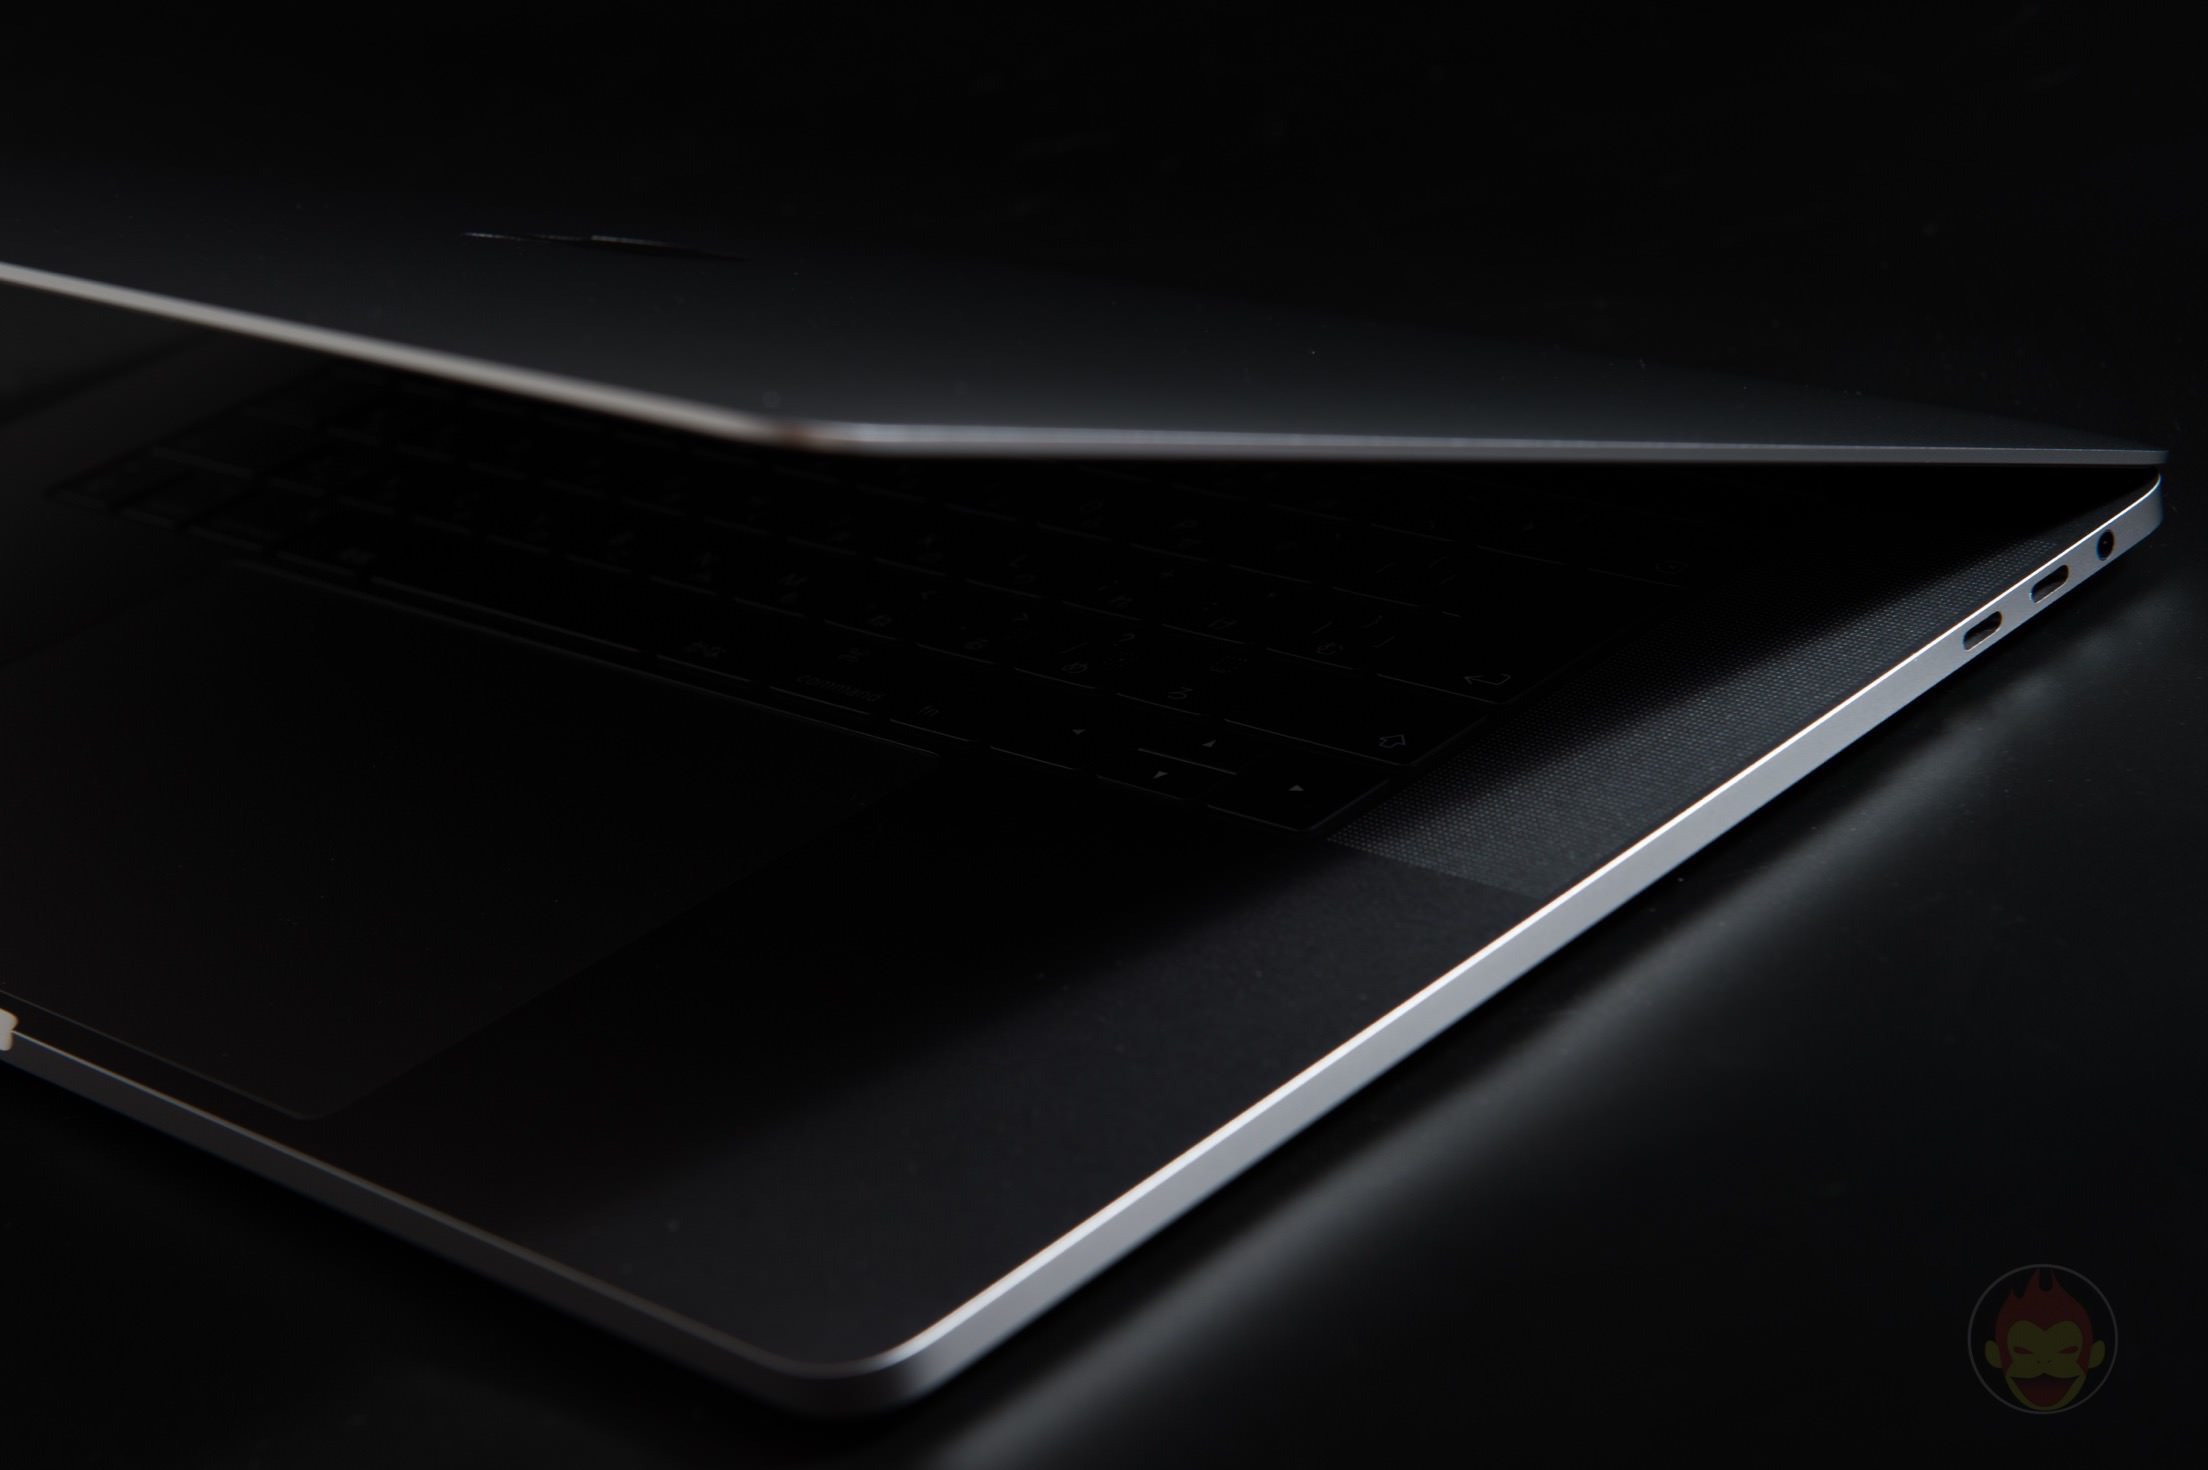 MacBook Pro 15inch 2017 Yamasha